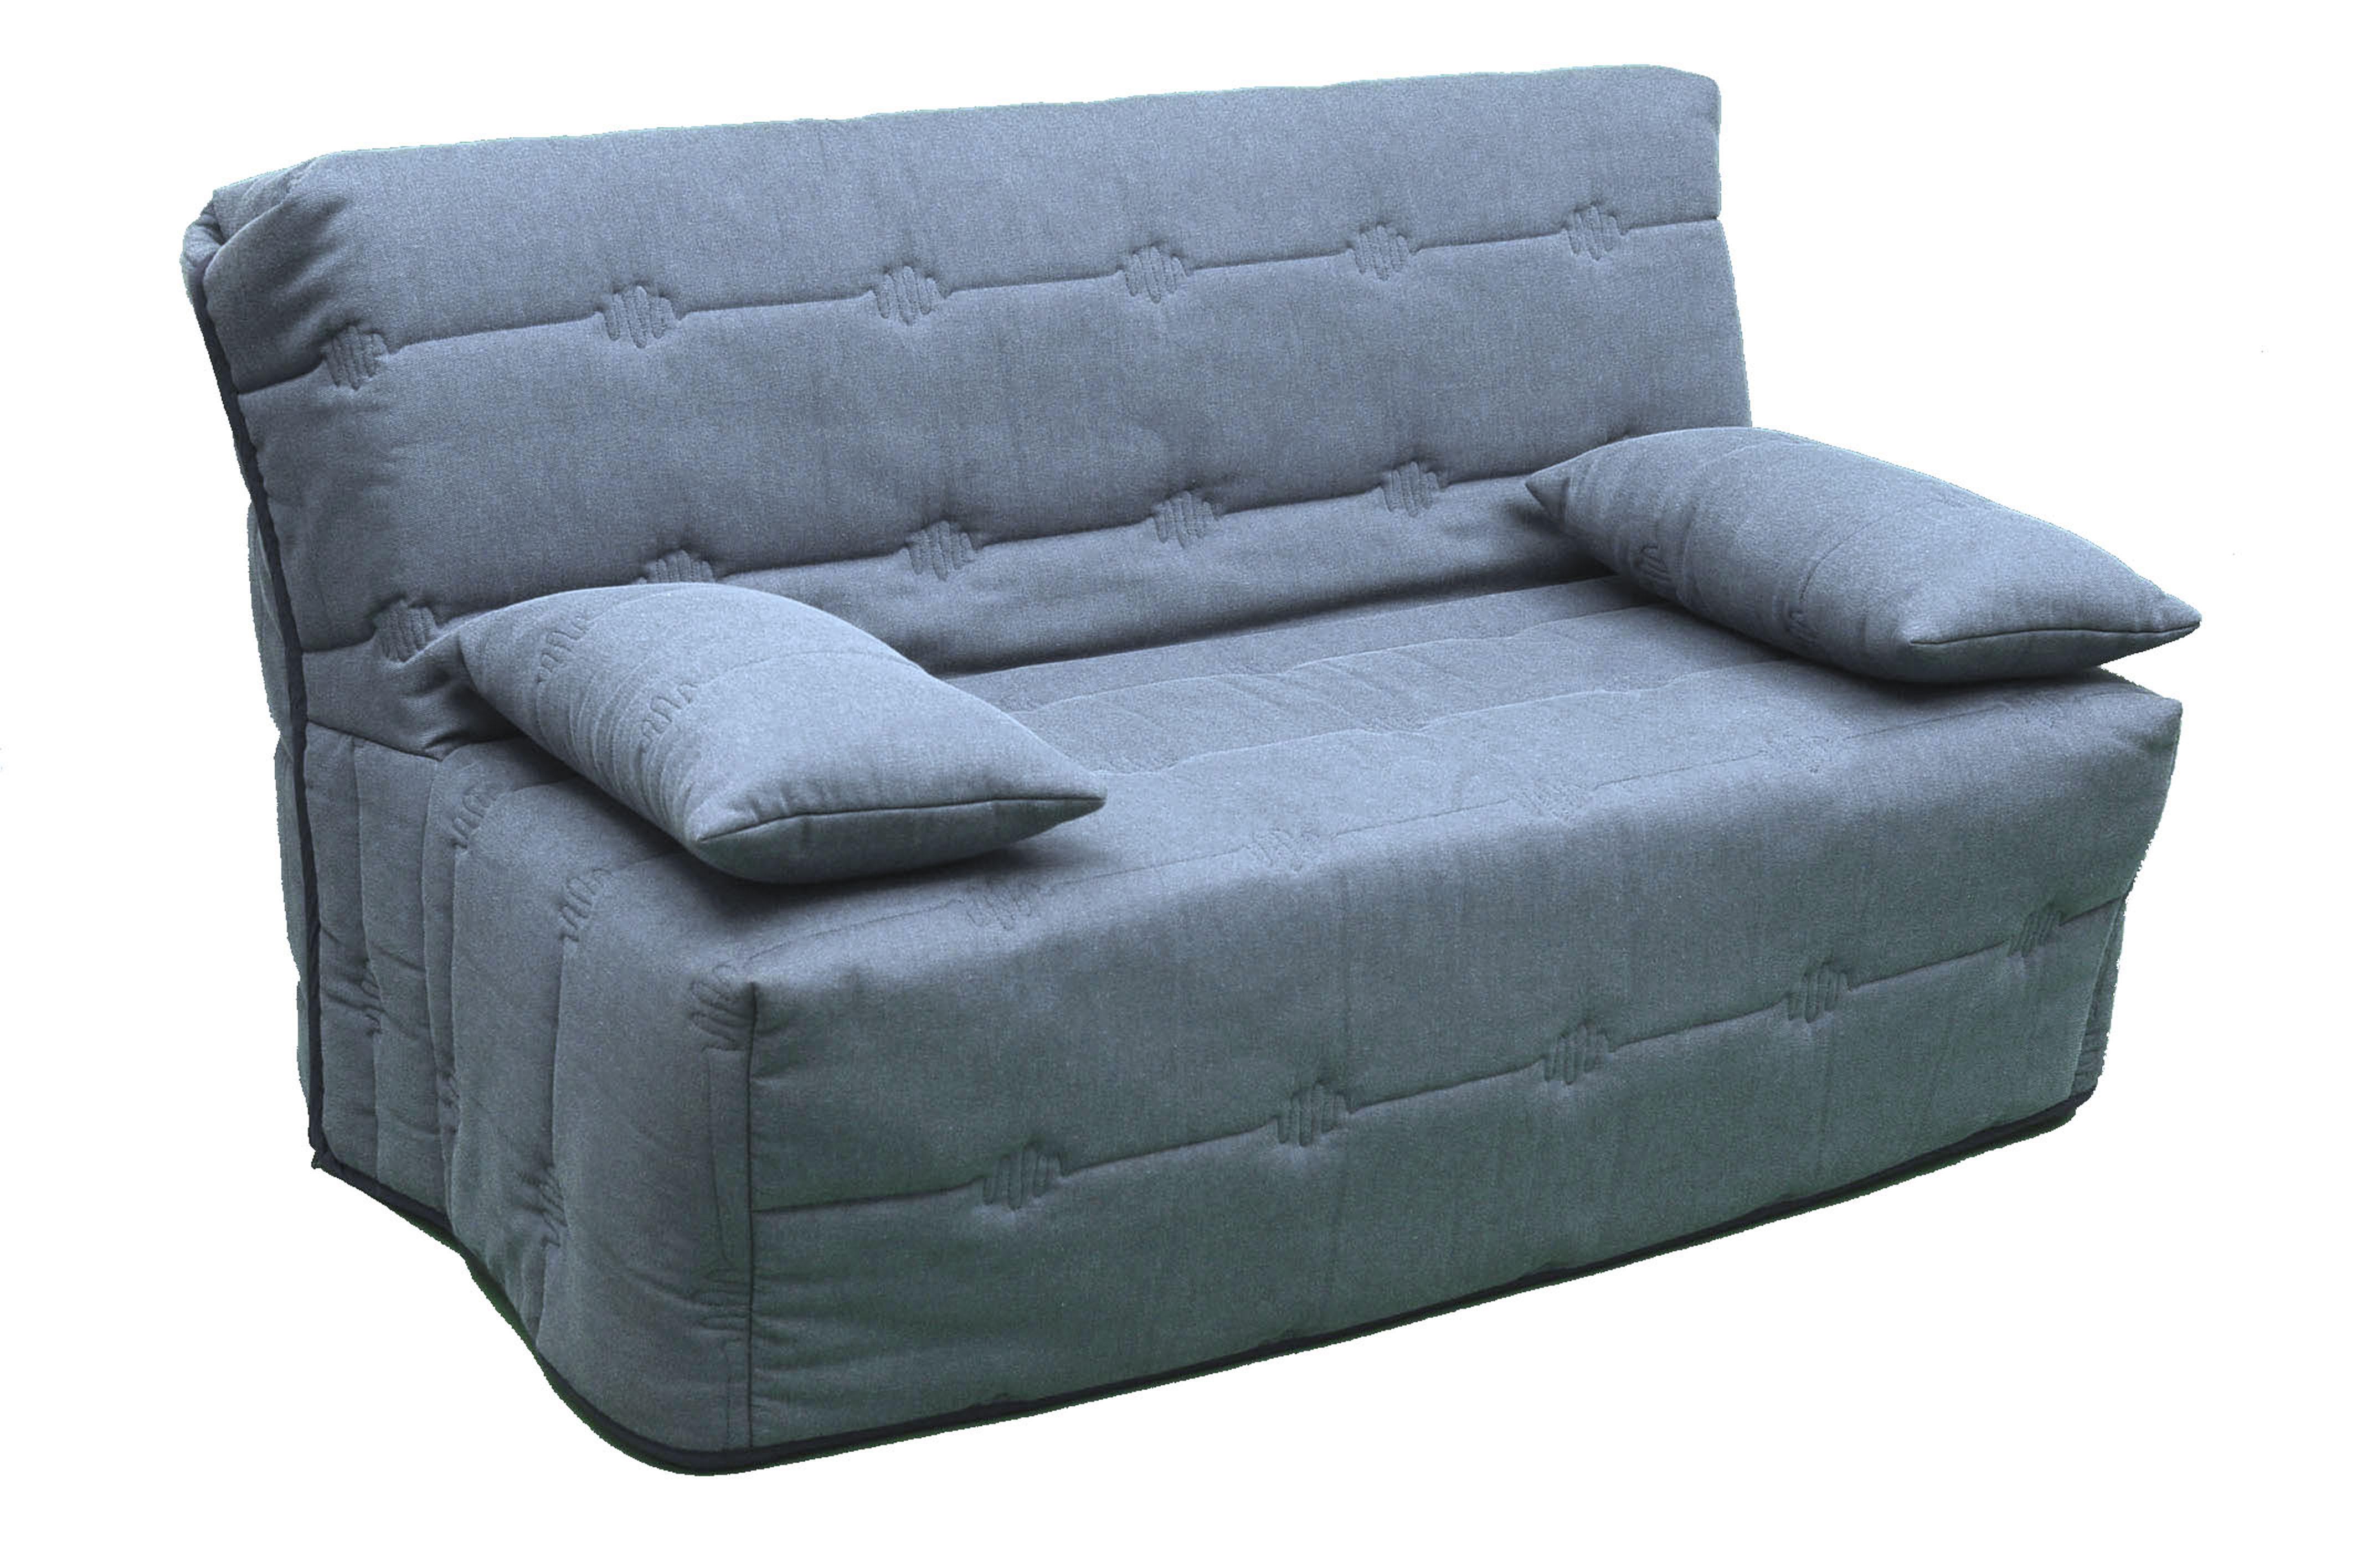 olympe literie cool ensemble matelas et sommier ensemble hebe x olympe literie with olympe. Black Bedroom Furniture Sets. Home Design Ideas